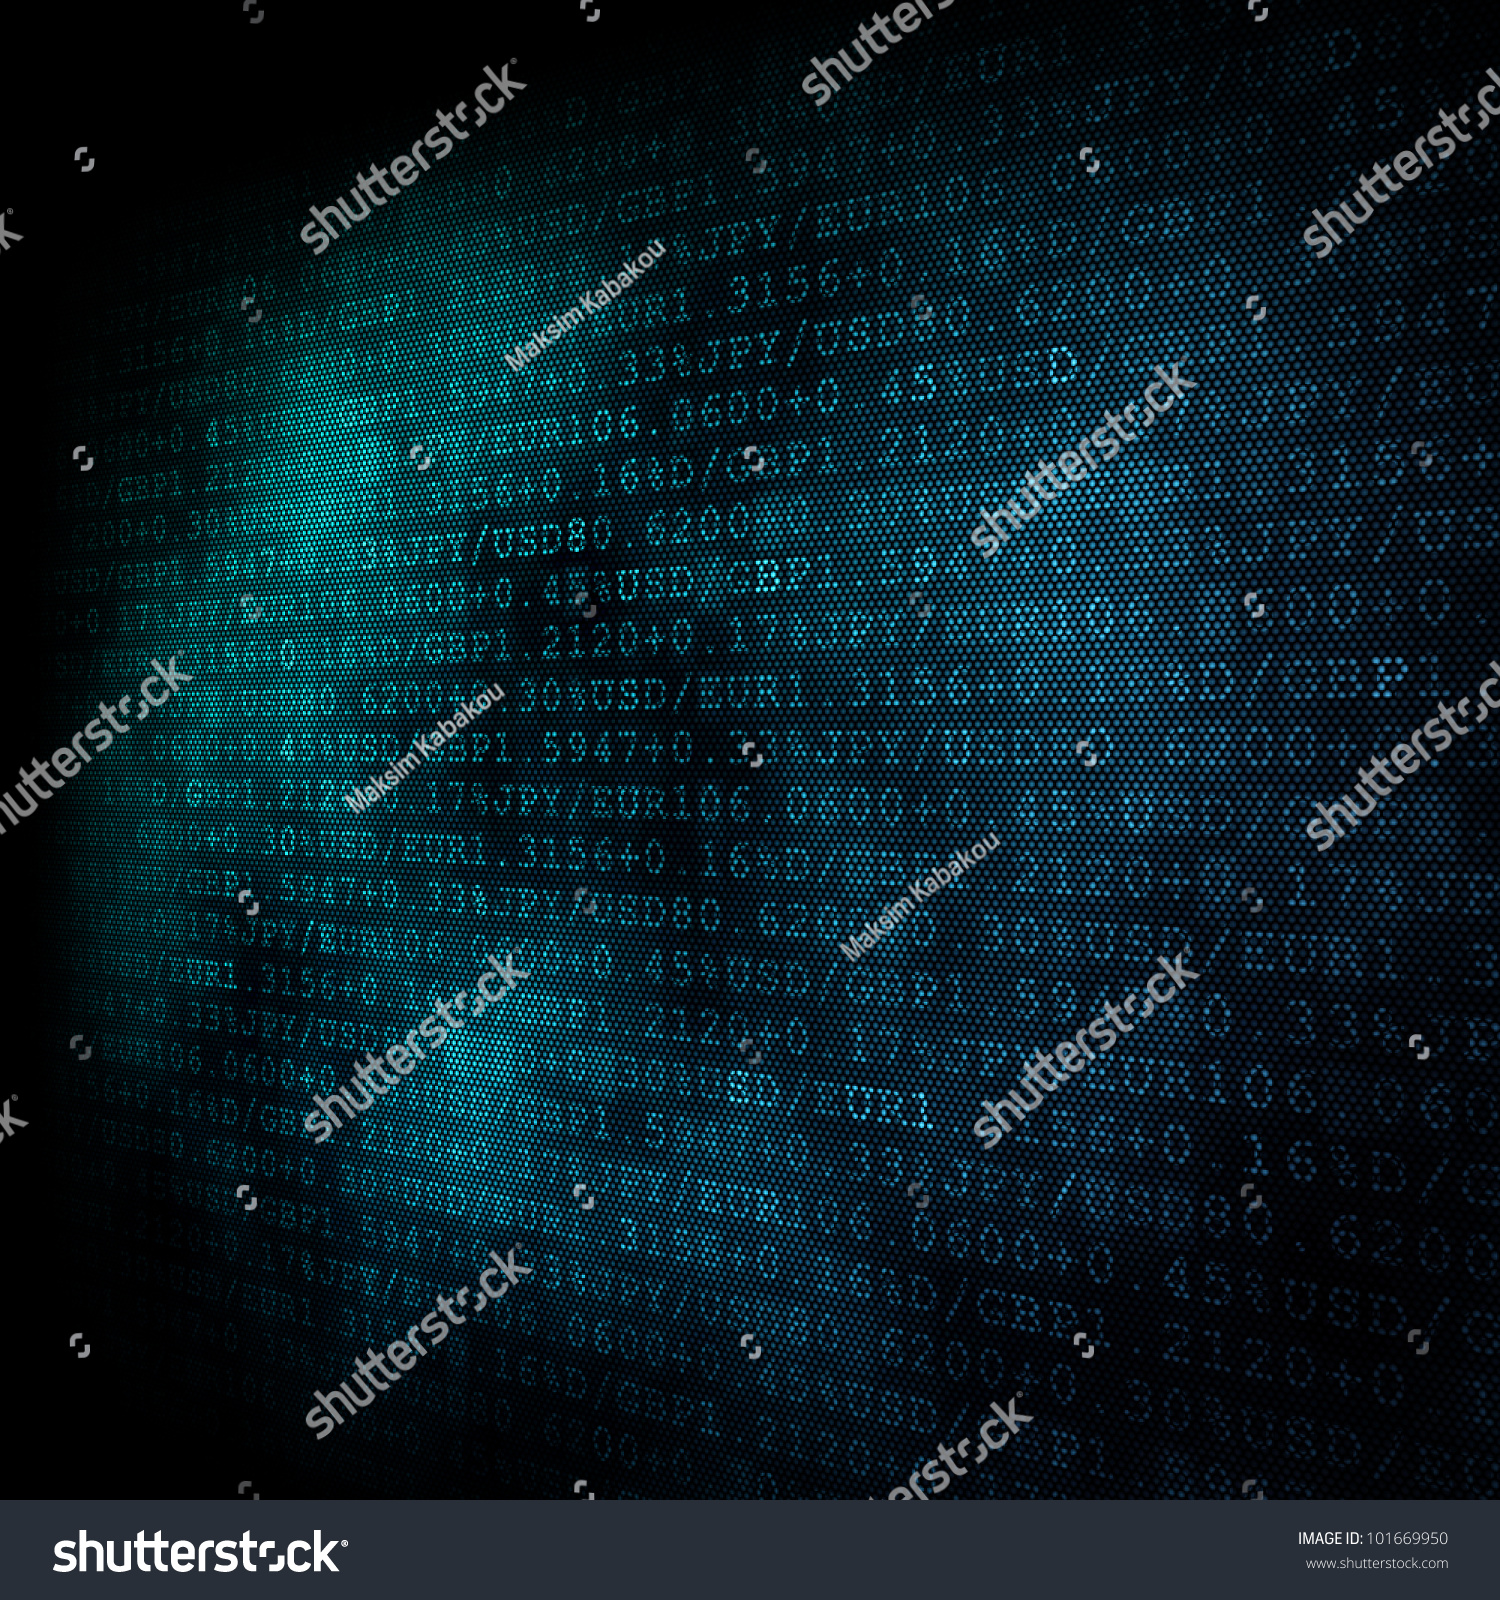 Finance Background: Pixeled Financial Background On Digital Screen Stock